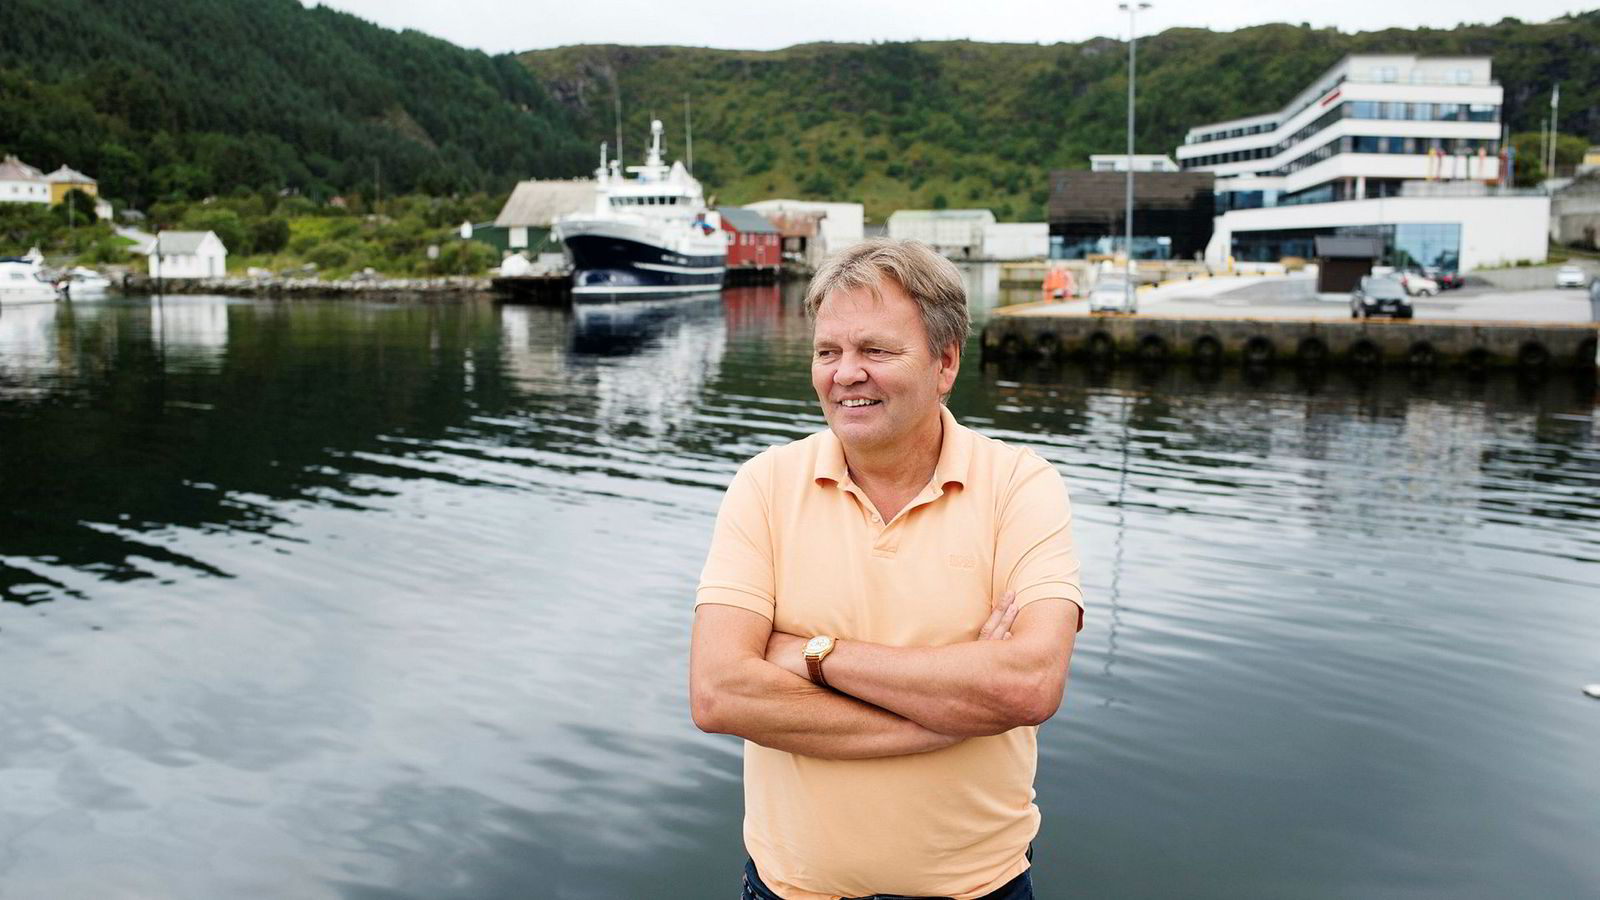 Stig Remøy eier SRR Invest, som tjener penger på torsketråler, krillbåt og offshorebåter i konsernet. Her er han i havnen på hjemplassen Fosnavåg.